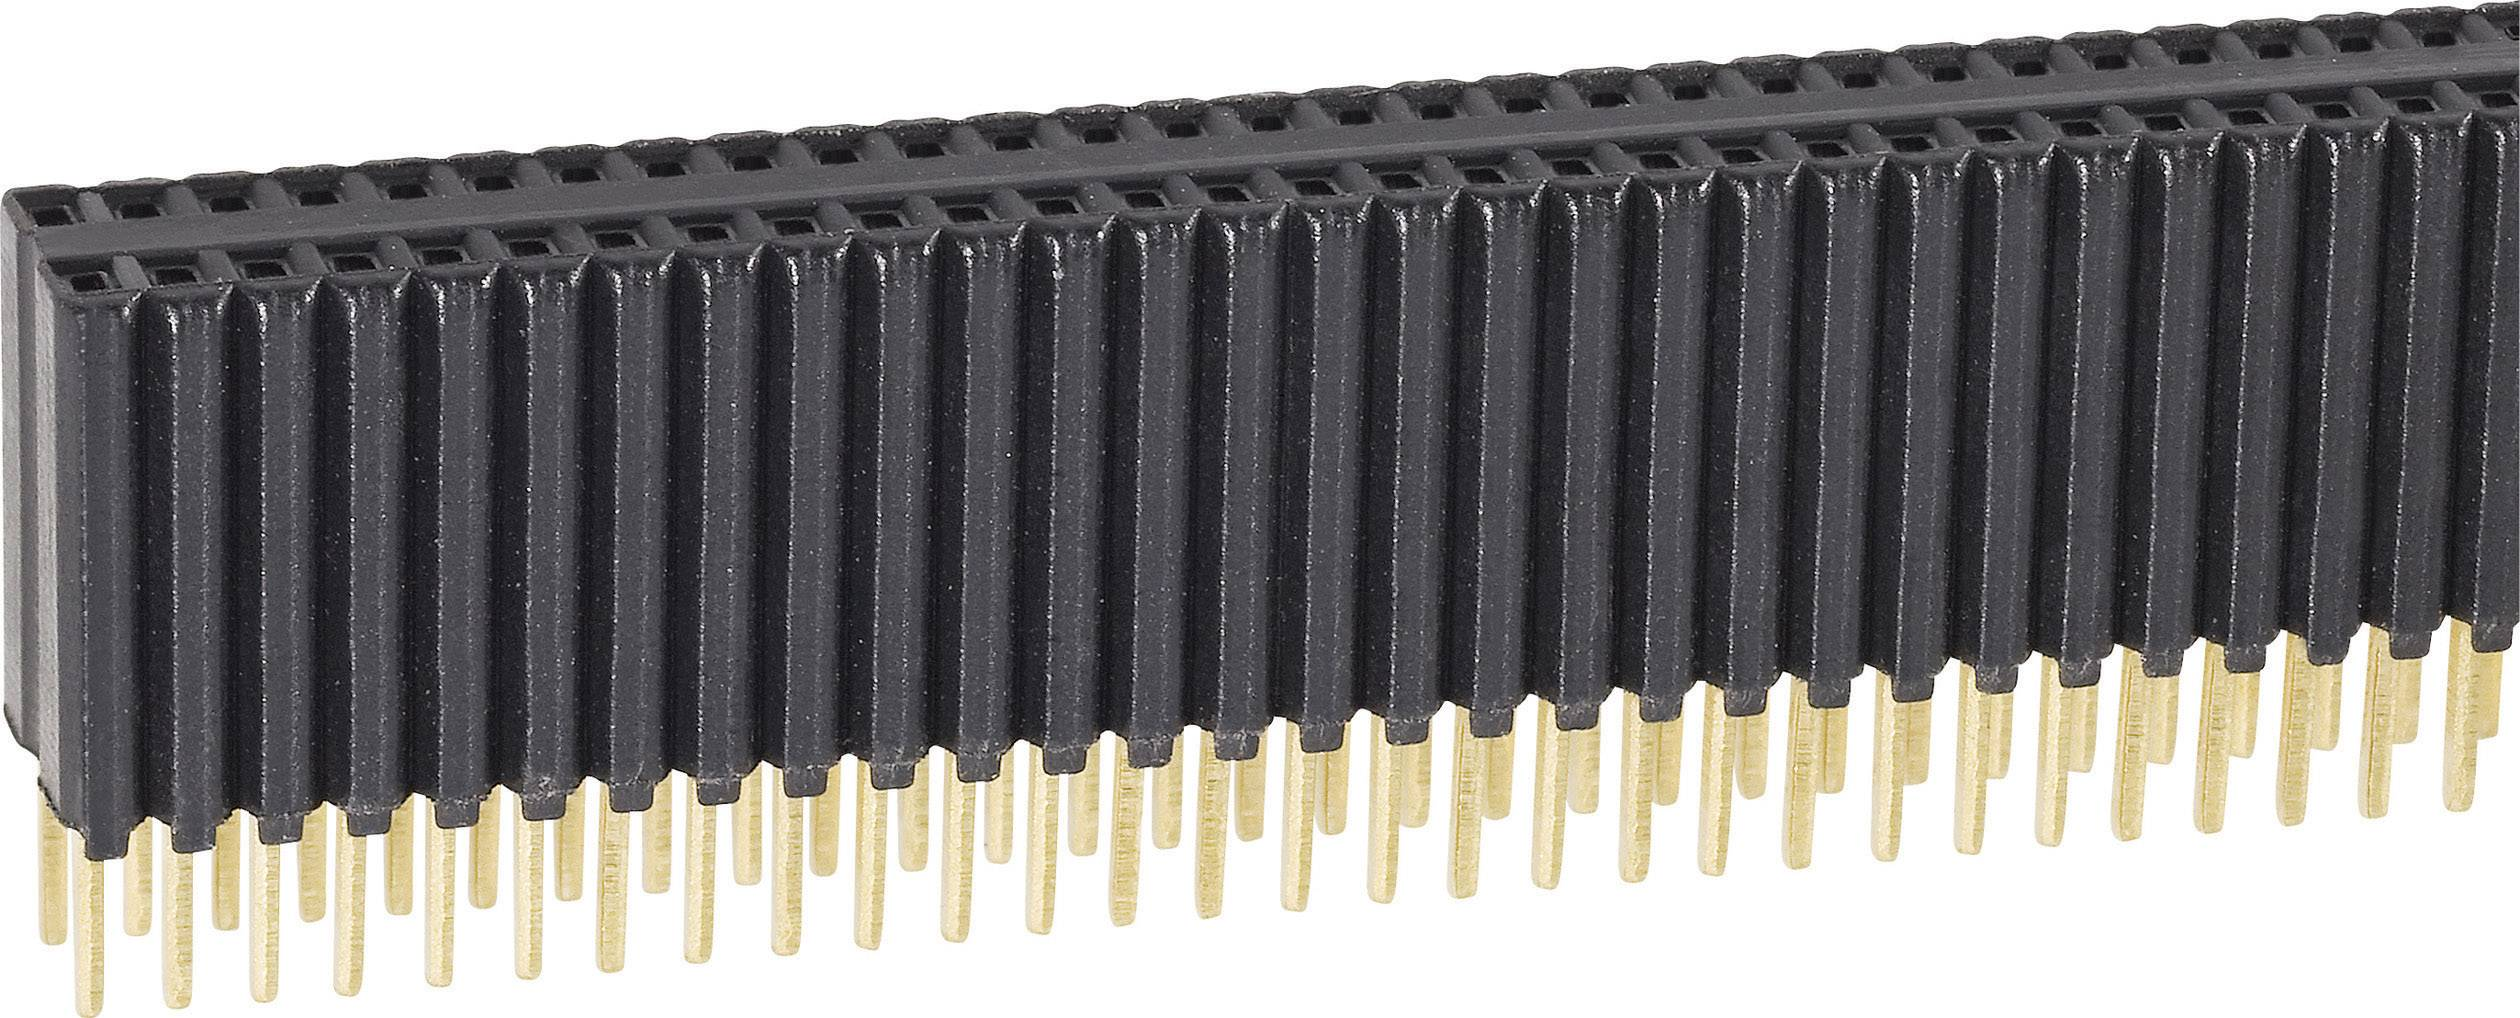 Zásuvková lišta (štandardná) Fischer Elektronik BLM KG 2/ 72/G, řádky 2, kontakty na řádek 36, 1 ks